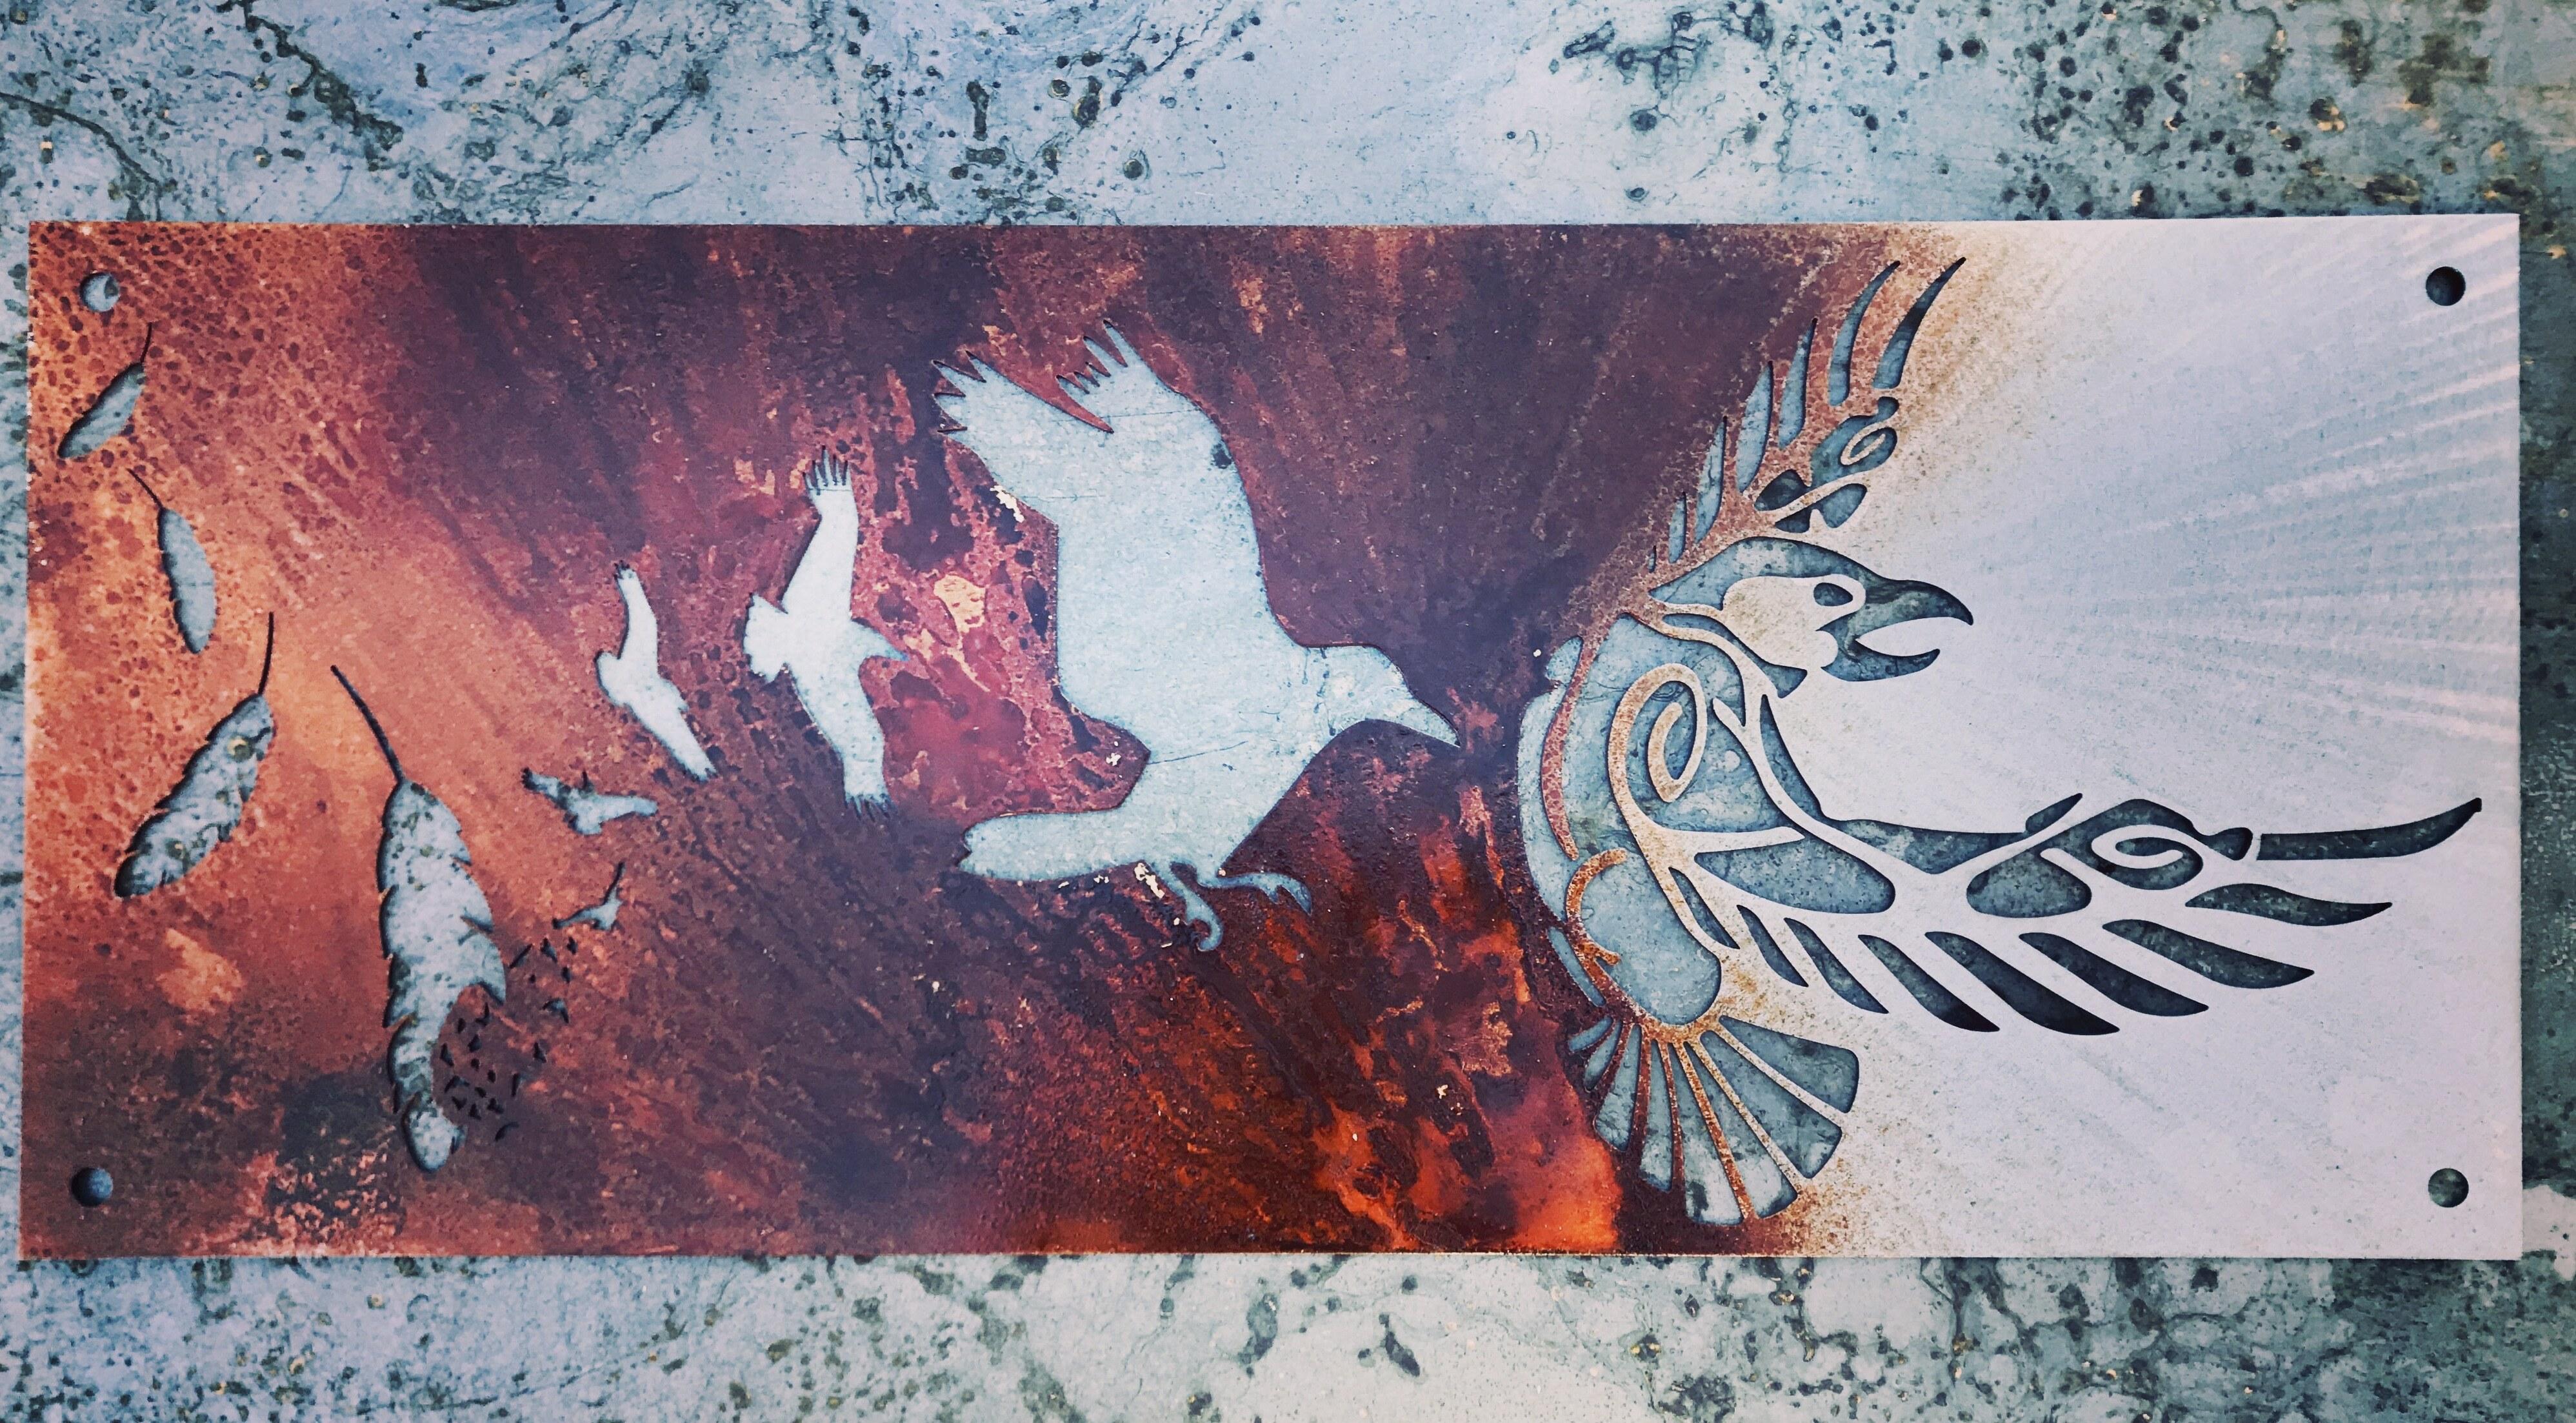 Odin, Pagan Decor, Odins Raven, Viking Wall Art, Raven Wall Art, Metal Raven, Raven Wall Decor, Metal bird wall decor, Scrap Metal Art